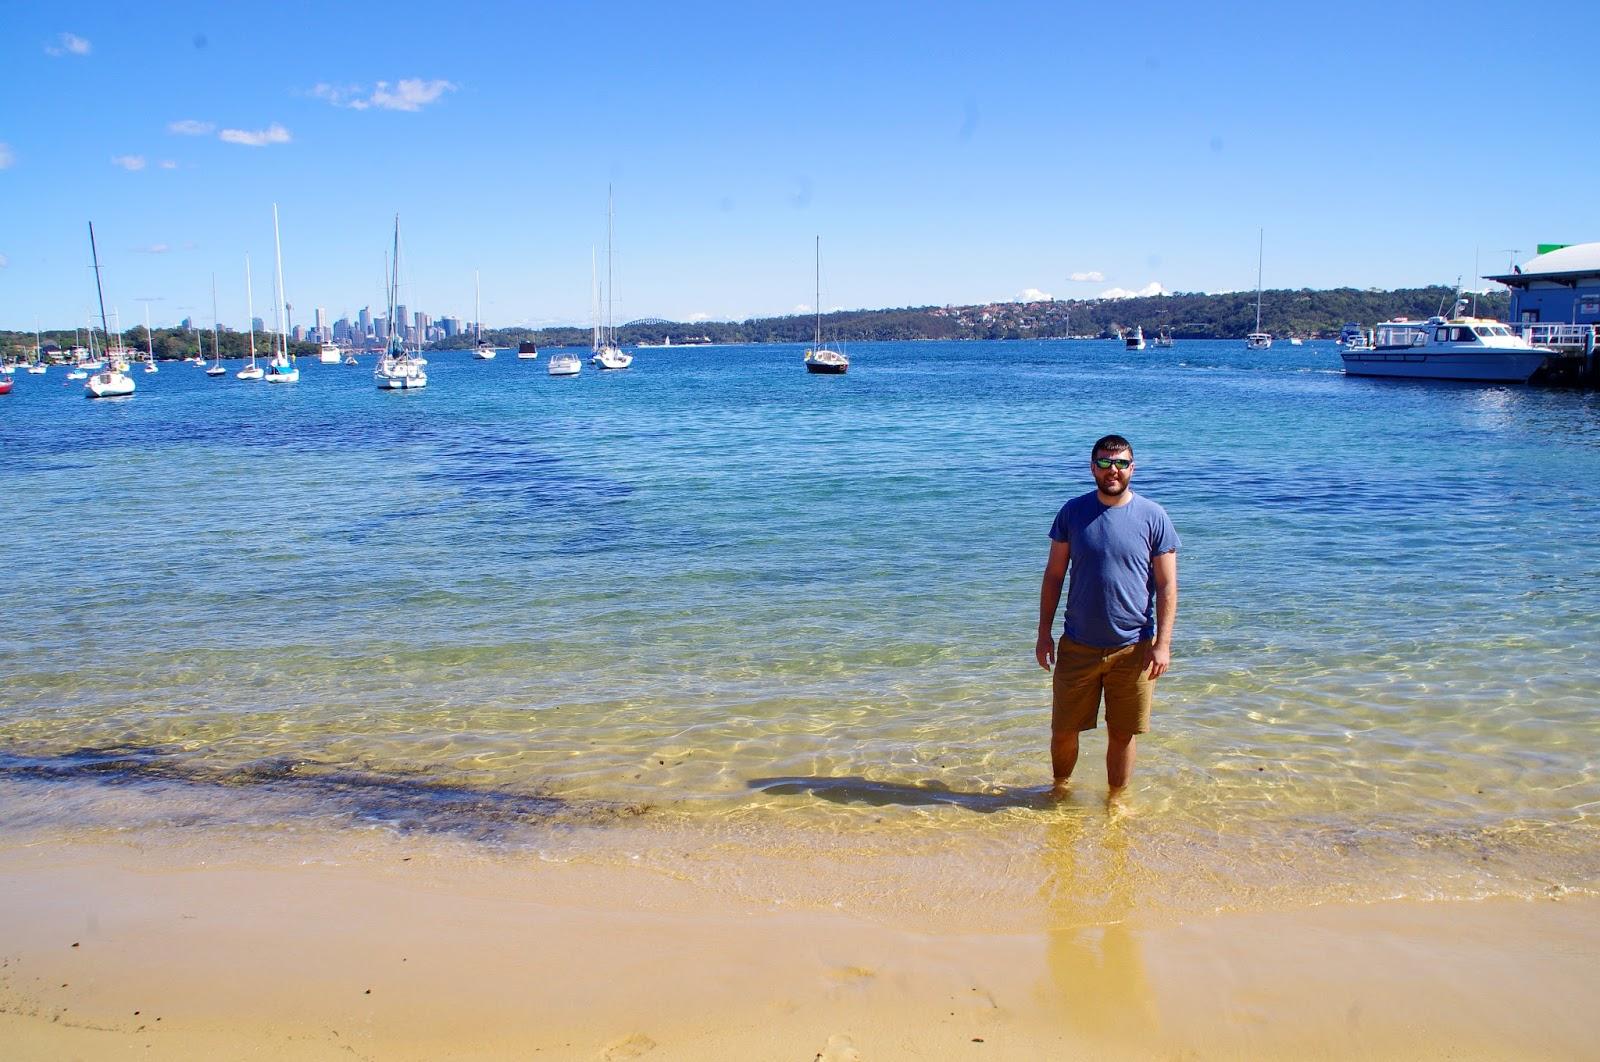 Dan paddling in Watsons Bay